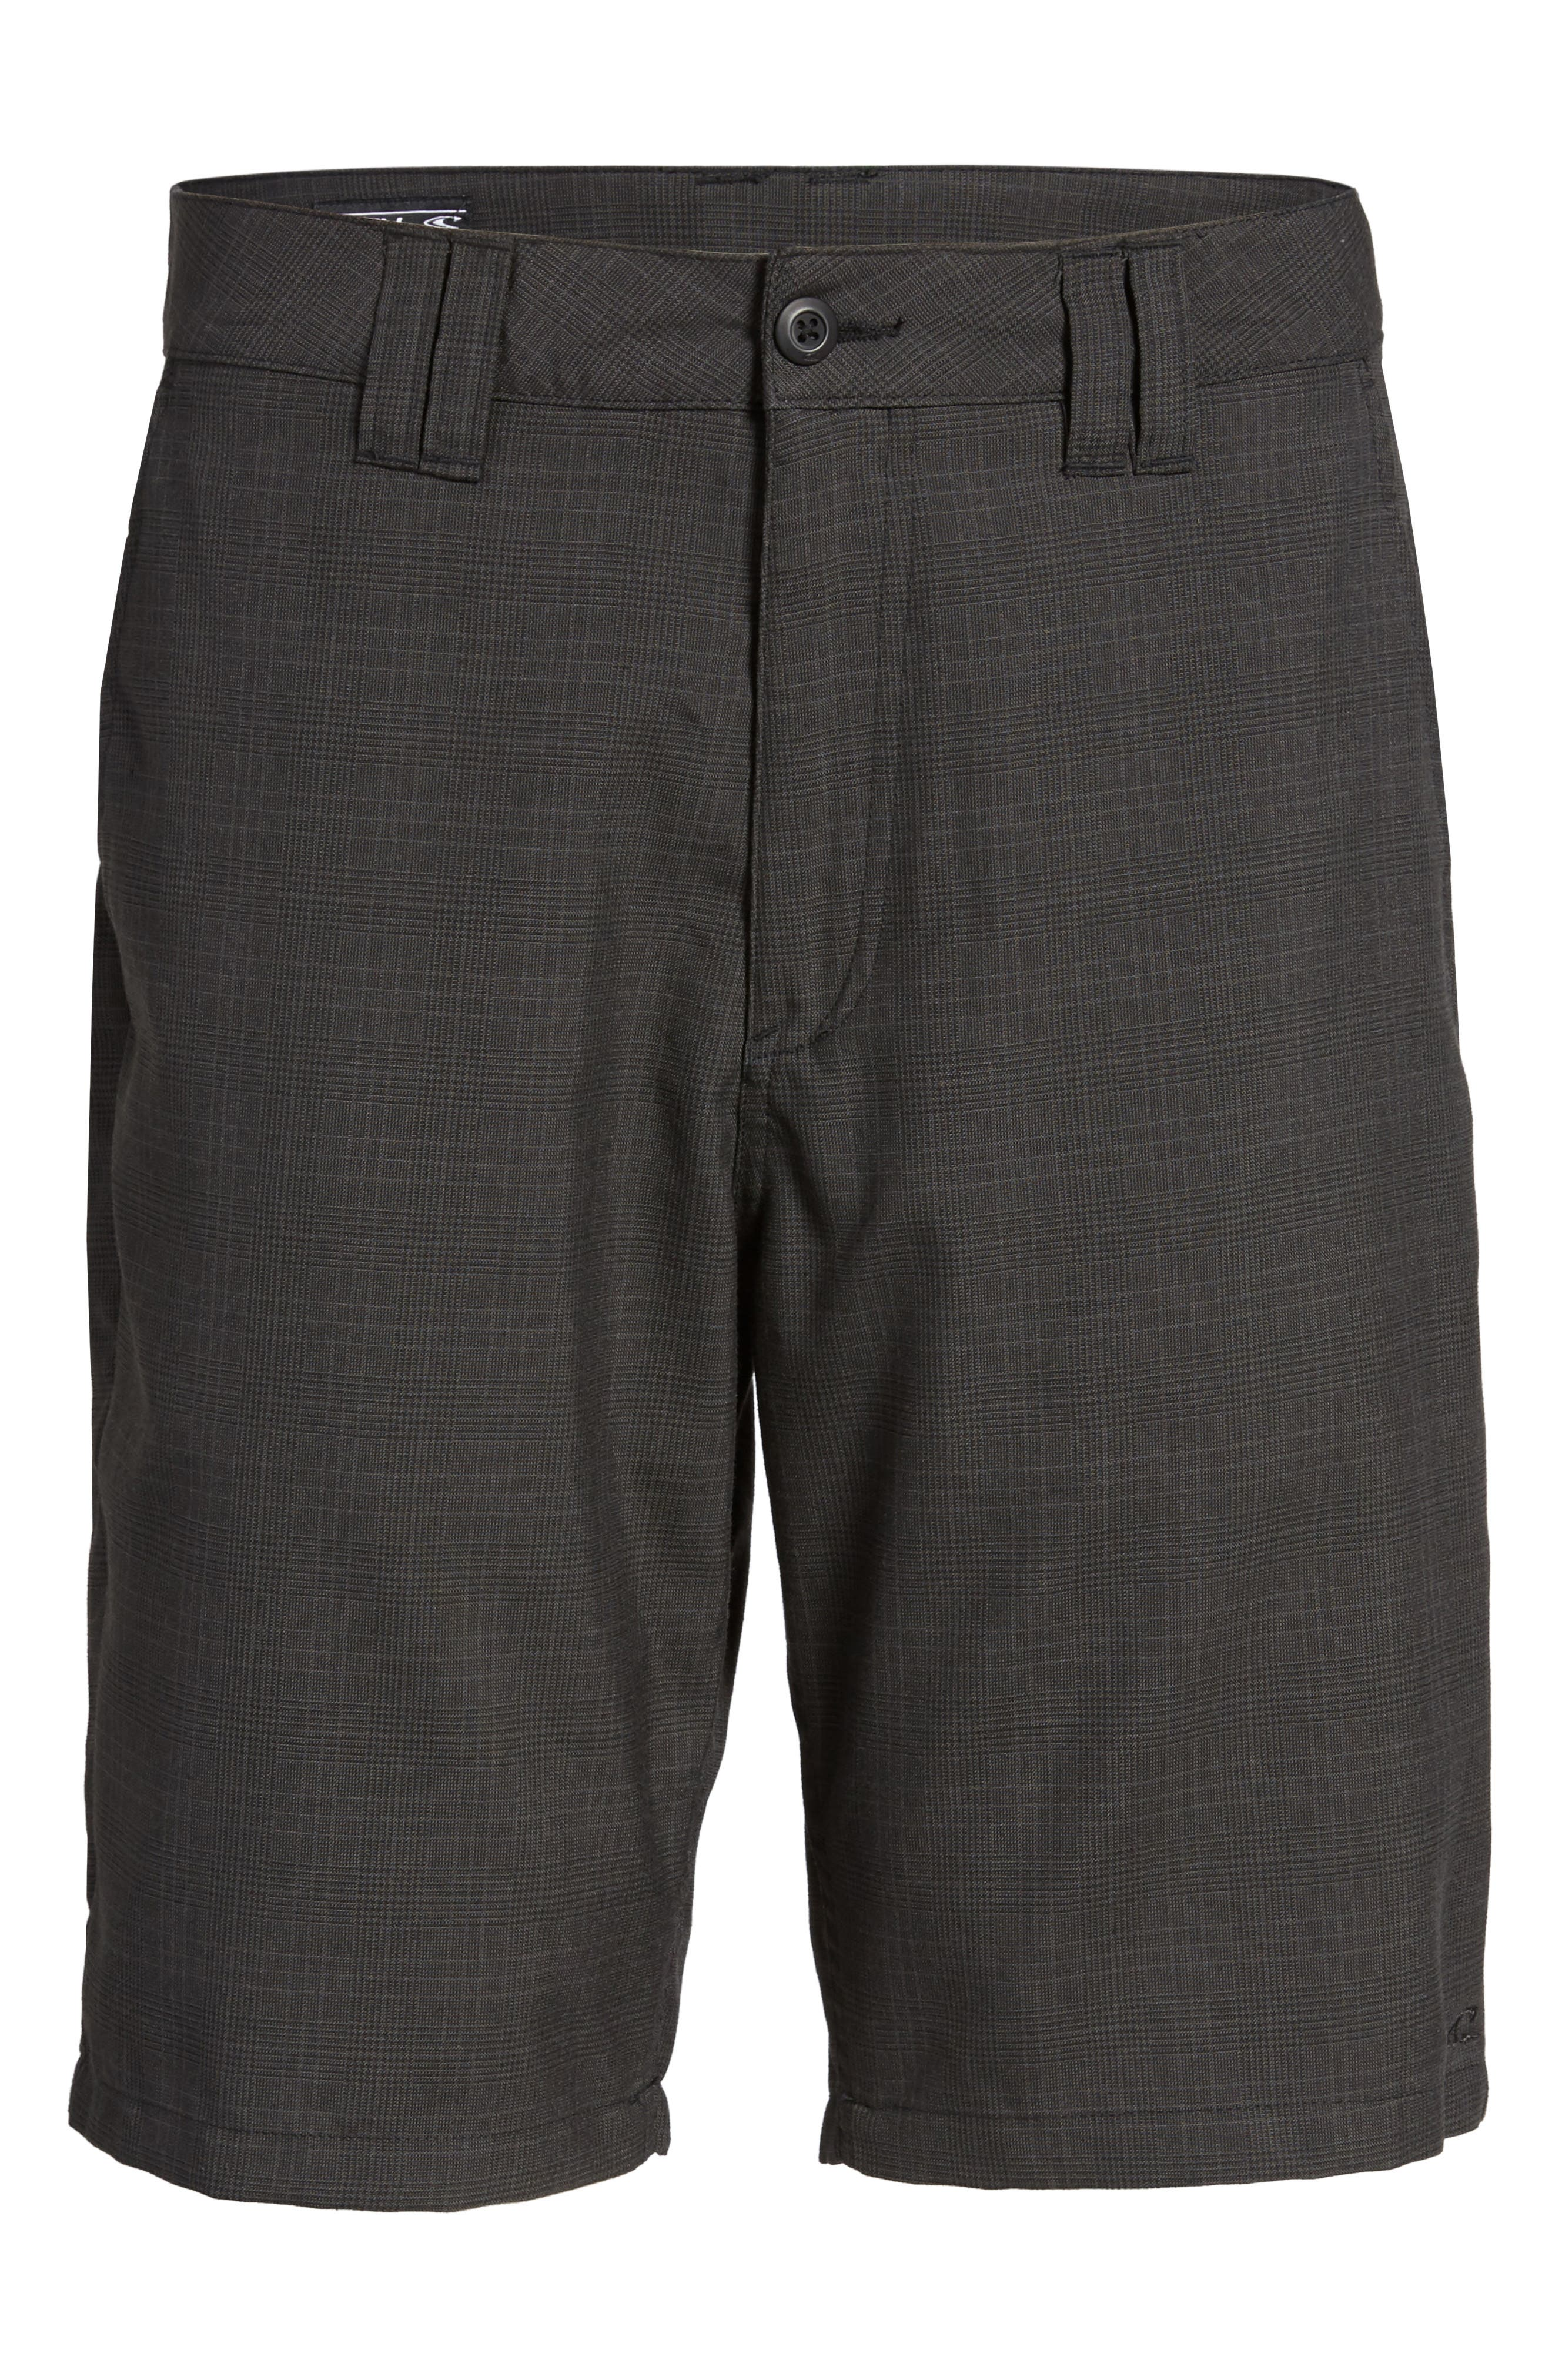 Delta Glen Plaid Shorts,                             Alternate thumbnail 6, color,                             Black